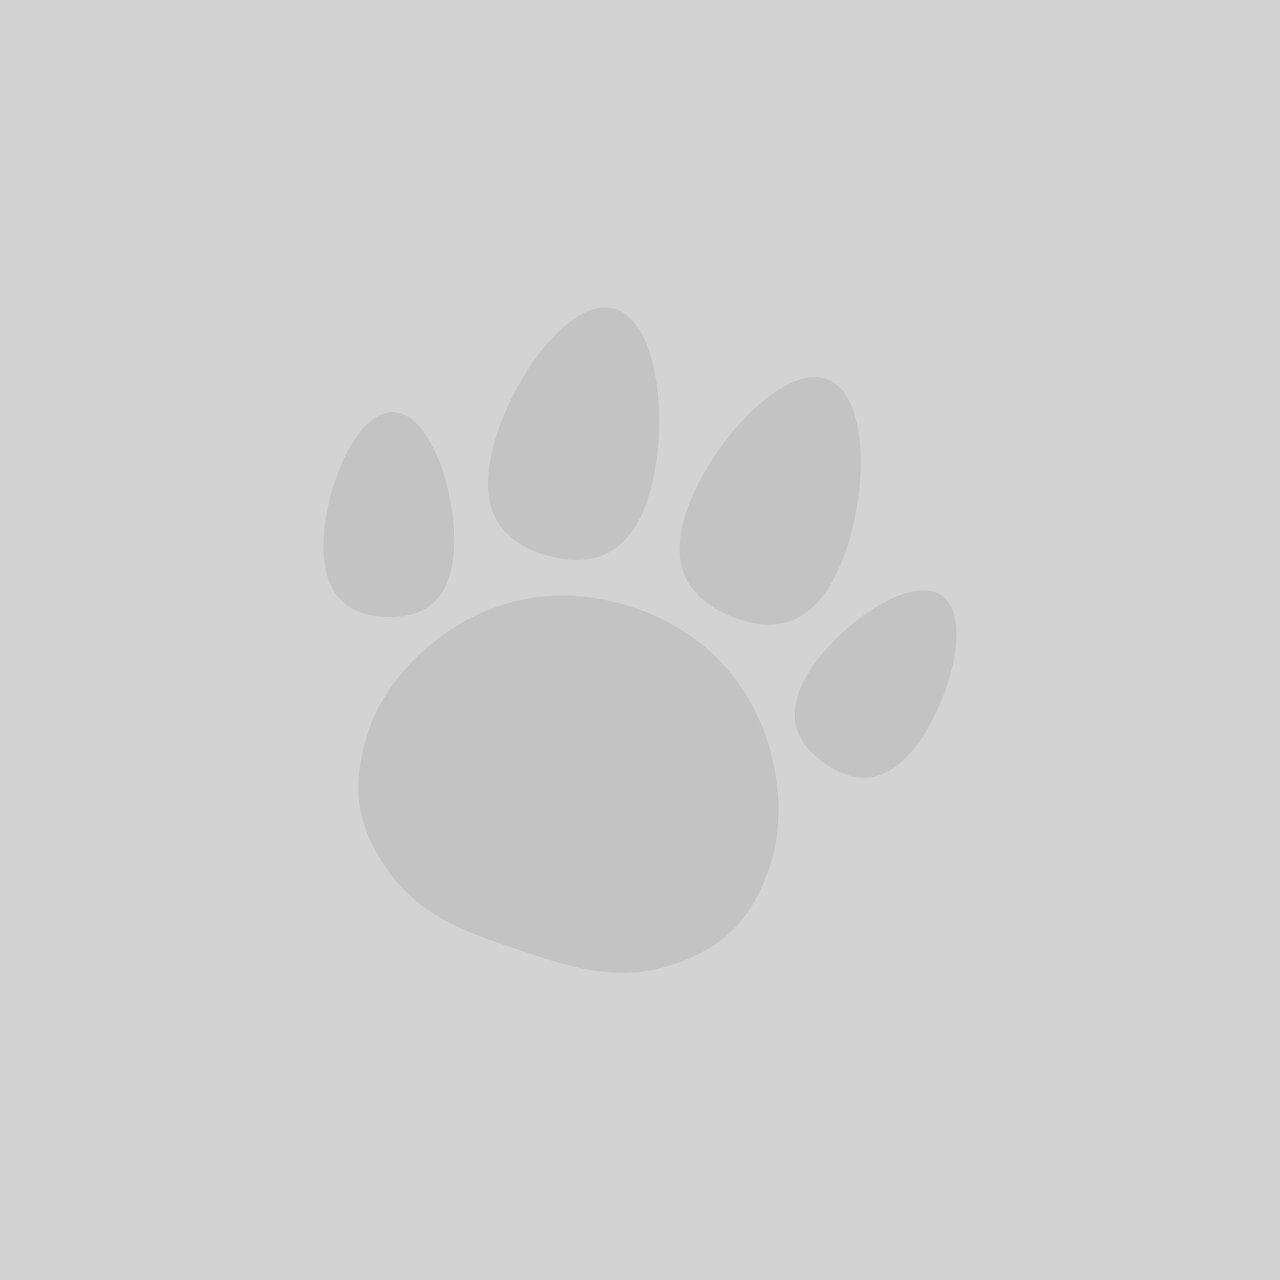 Greenies Grain Free Medium Dog Treat 170g